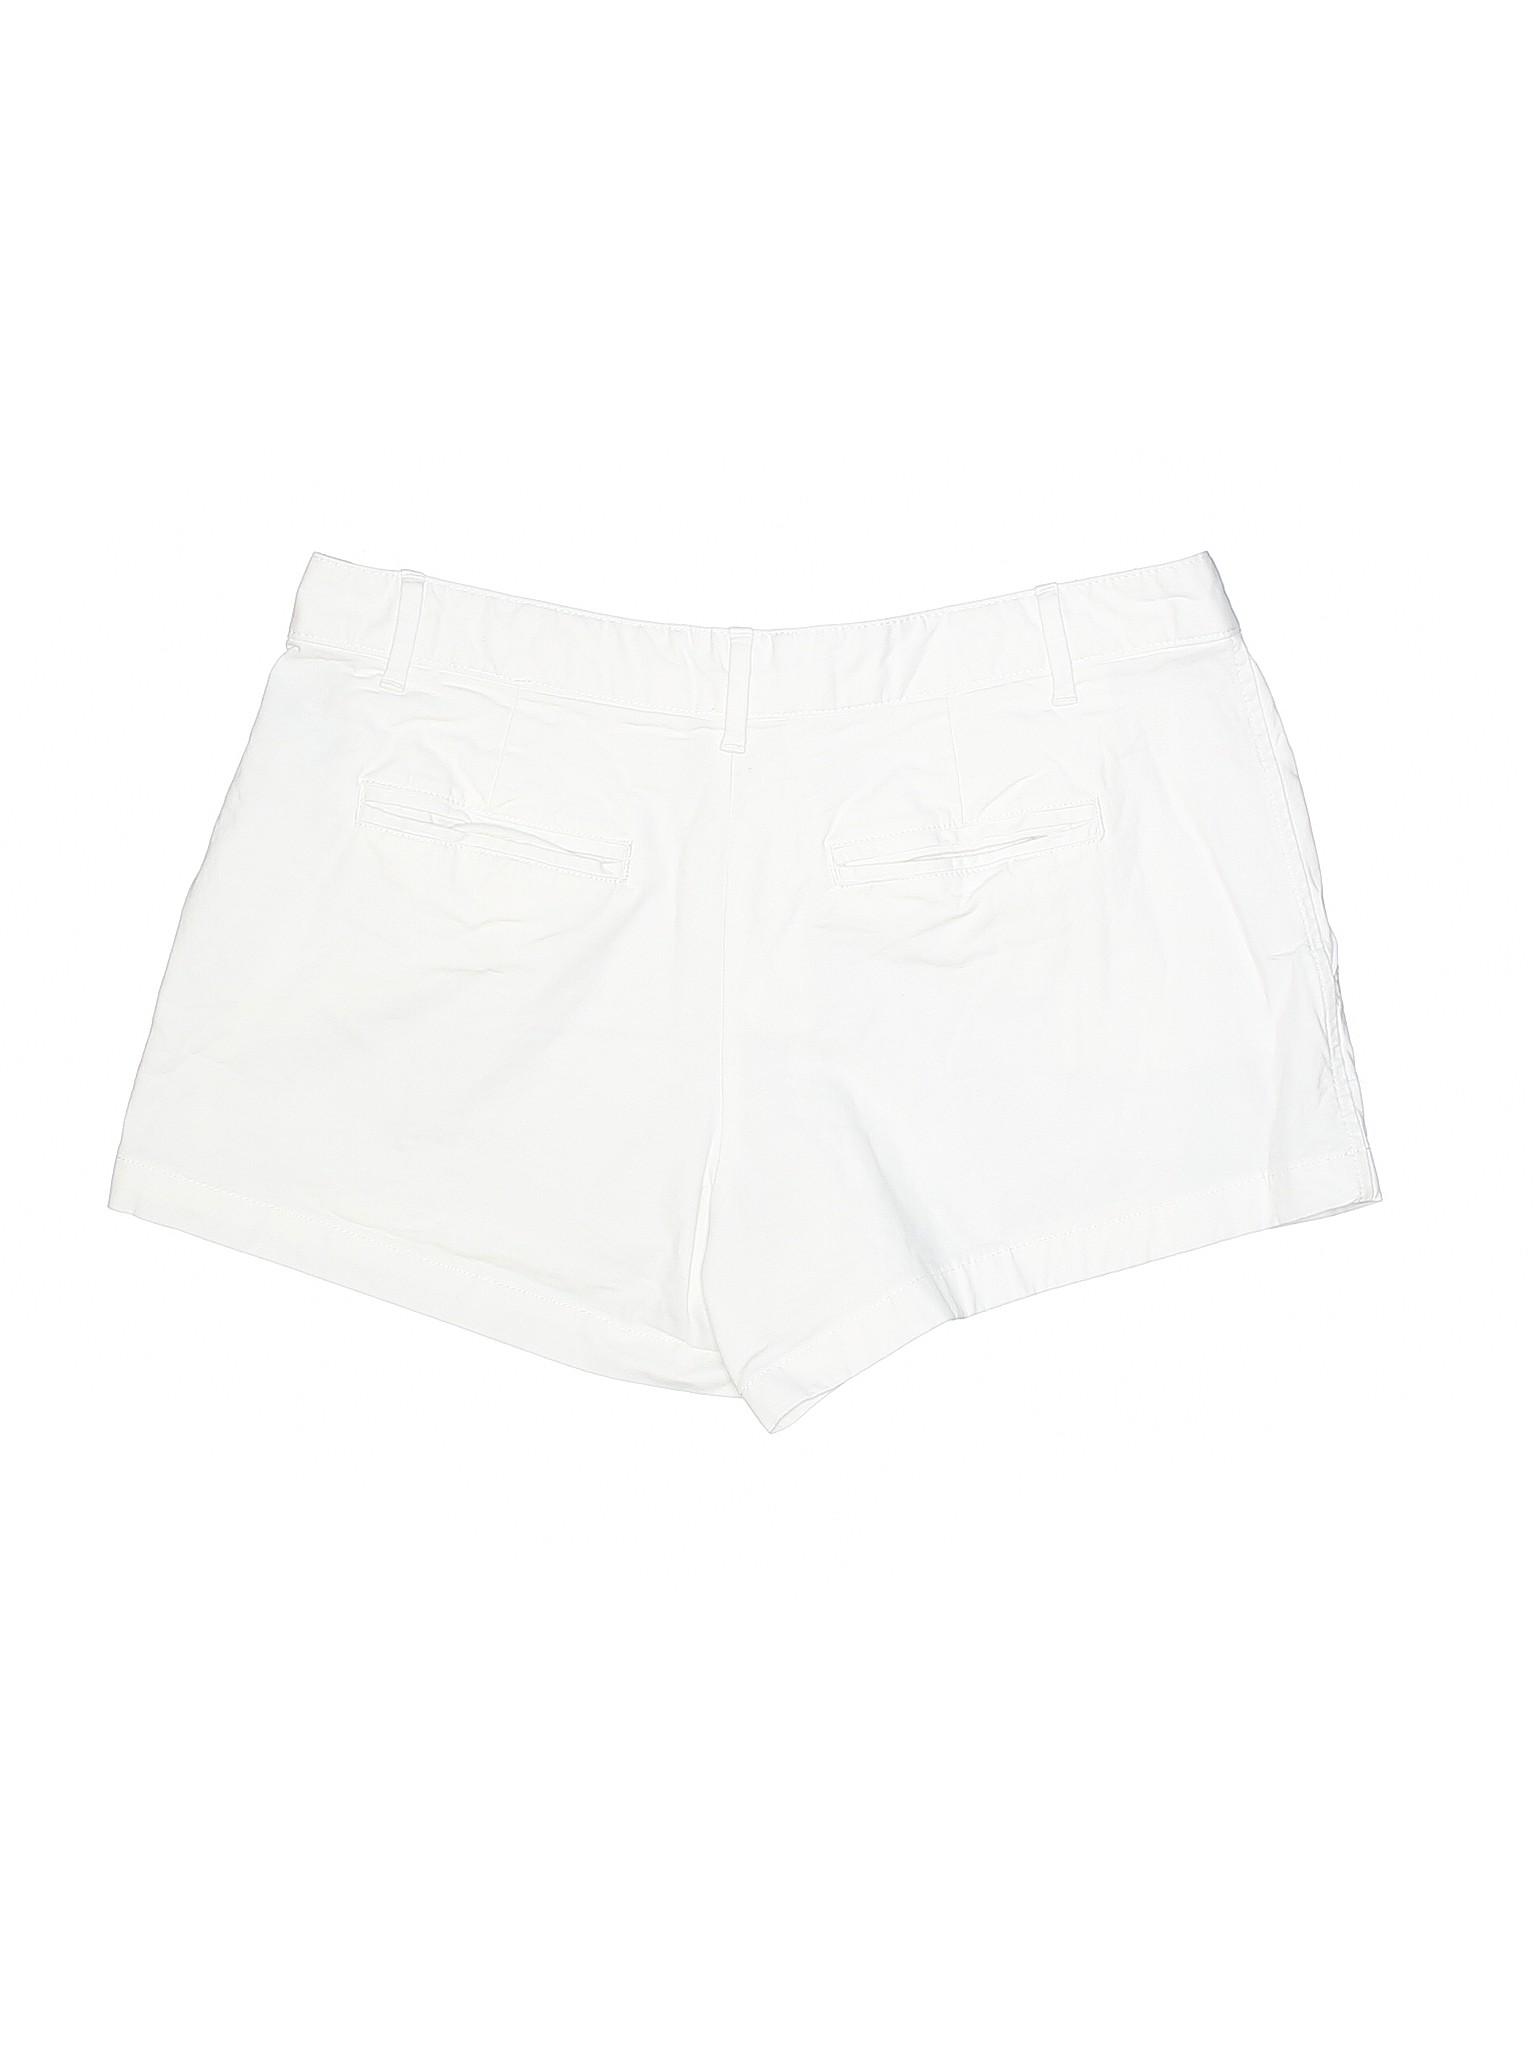 Shorts Shorts Gap Shorts Gap Gap Shorts Boutique Boutique Boutique Boutique Gap qZvnfEf